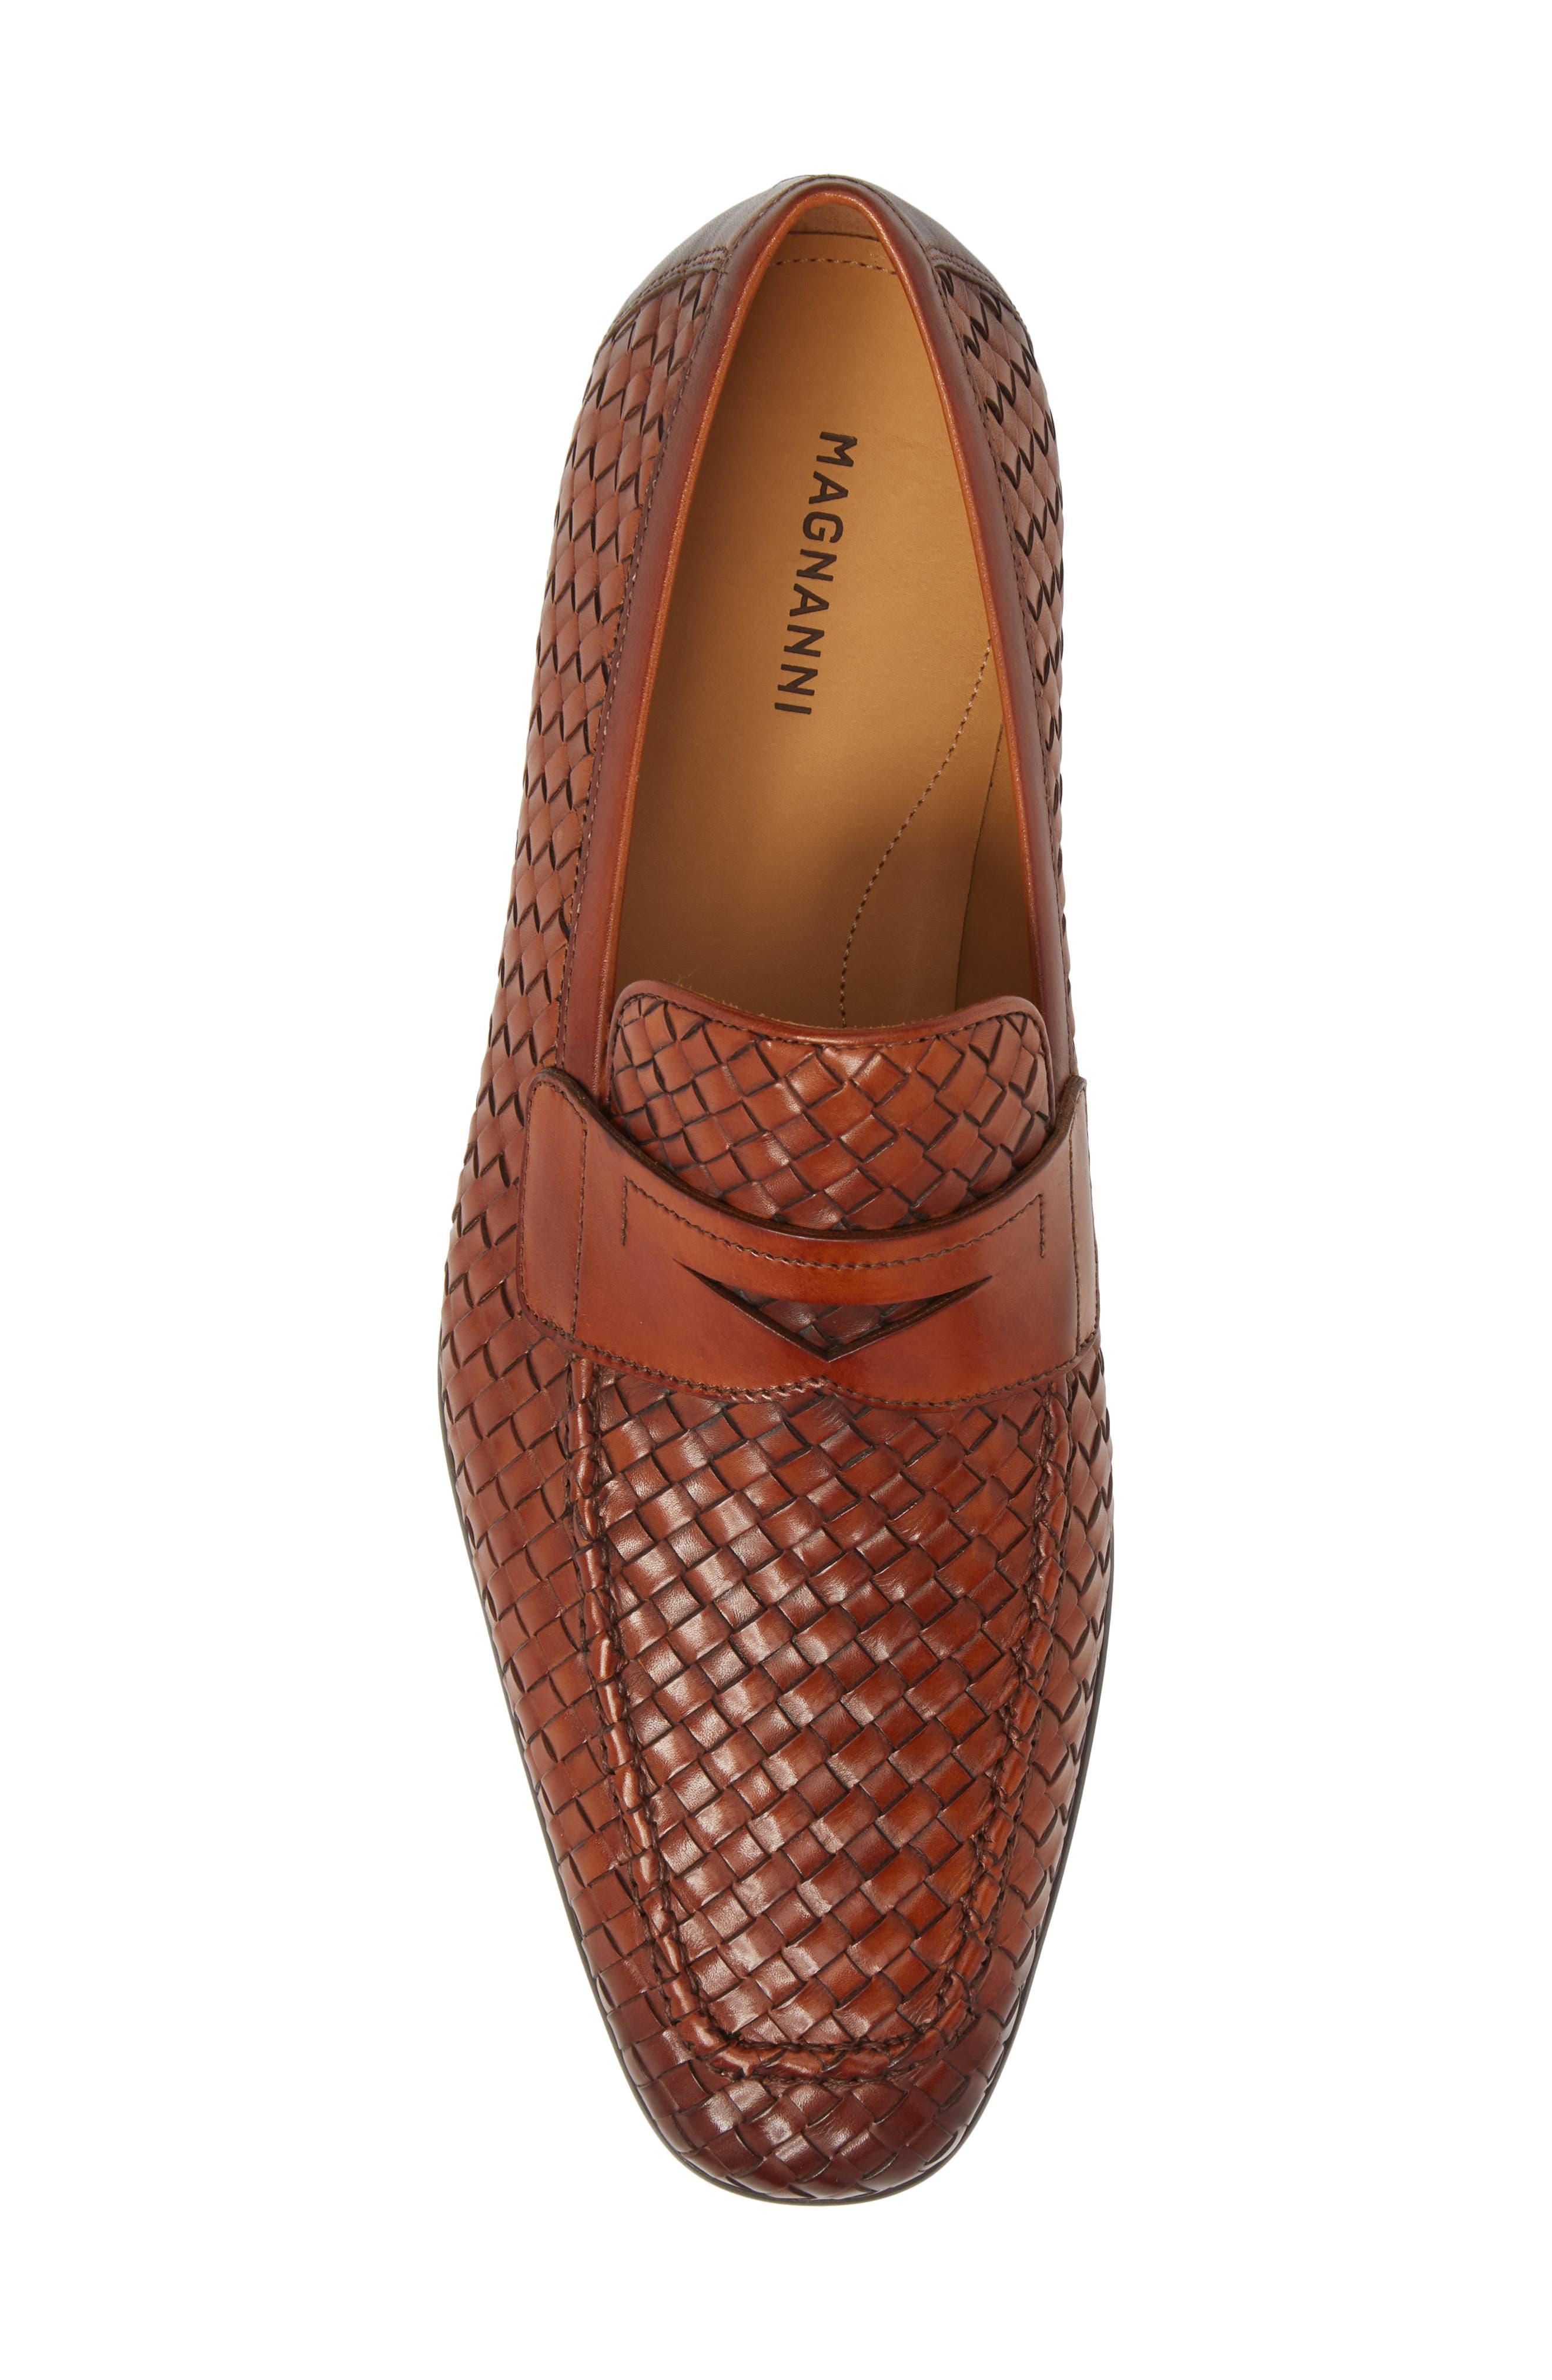 Rafa II Woven Penny Loafer,                             Alternate thumbnail 5, color,                             Cognac Leather